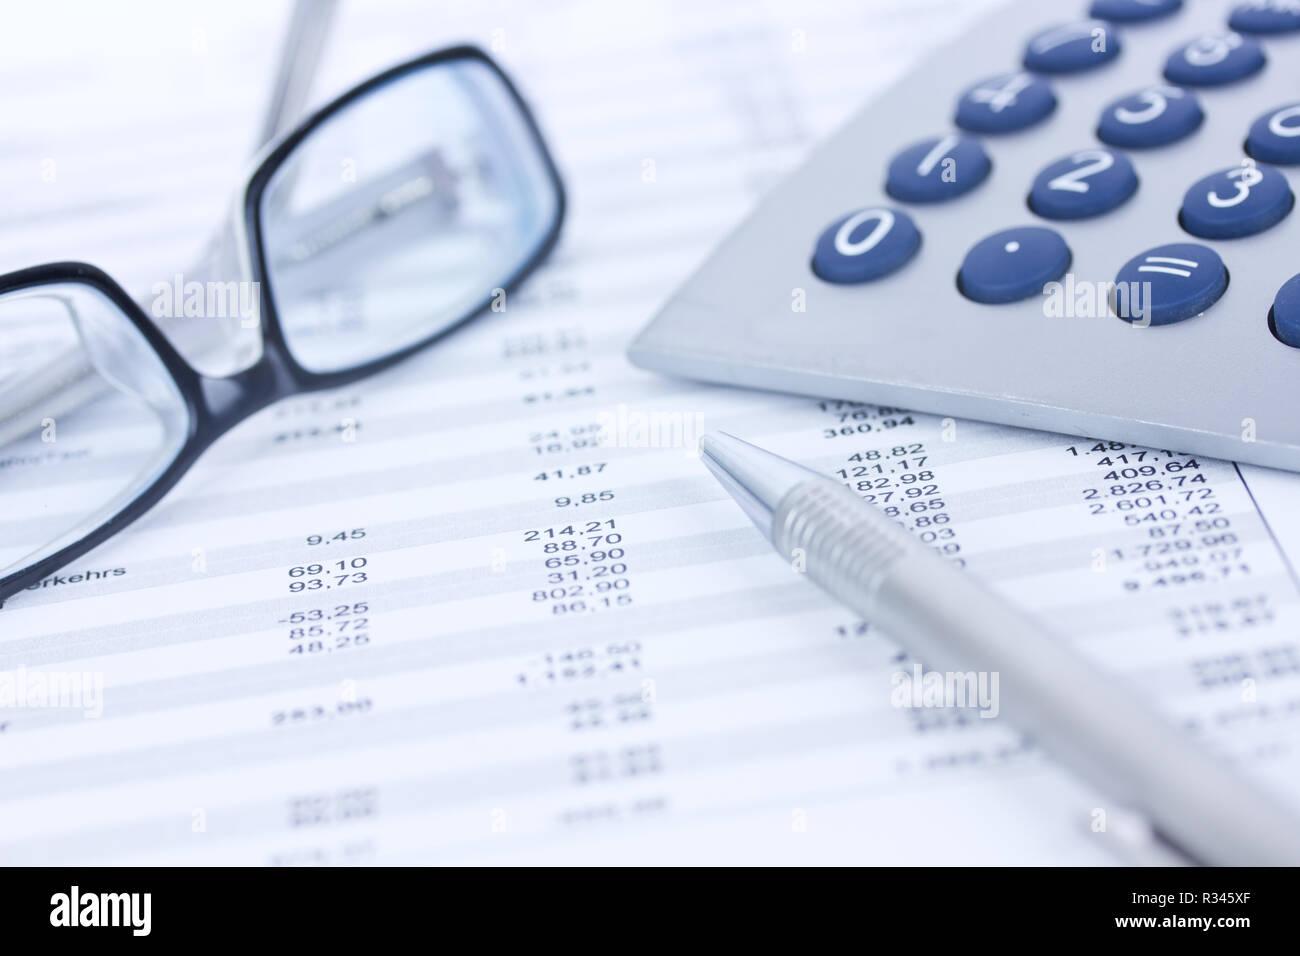 calculators and columns of figures Stock Photo